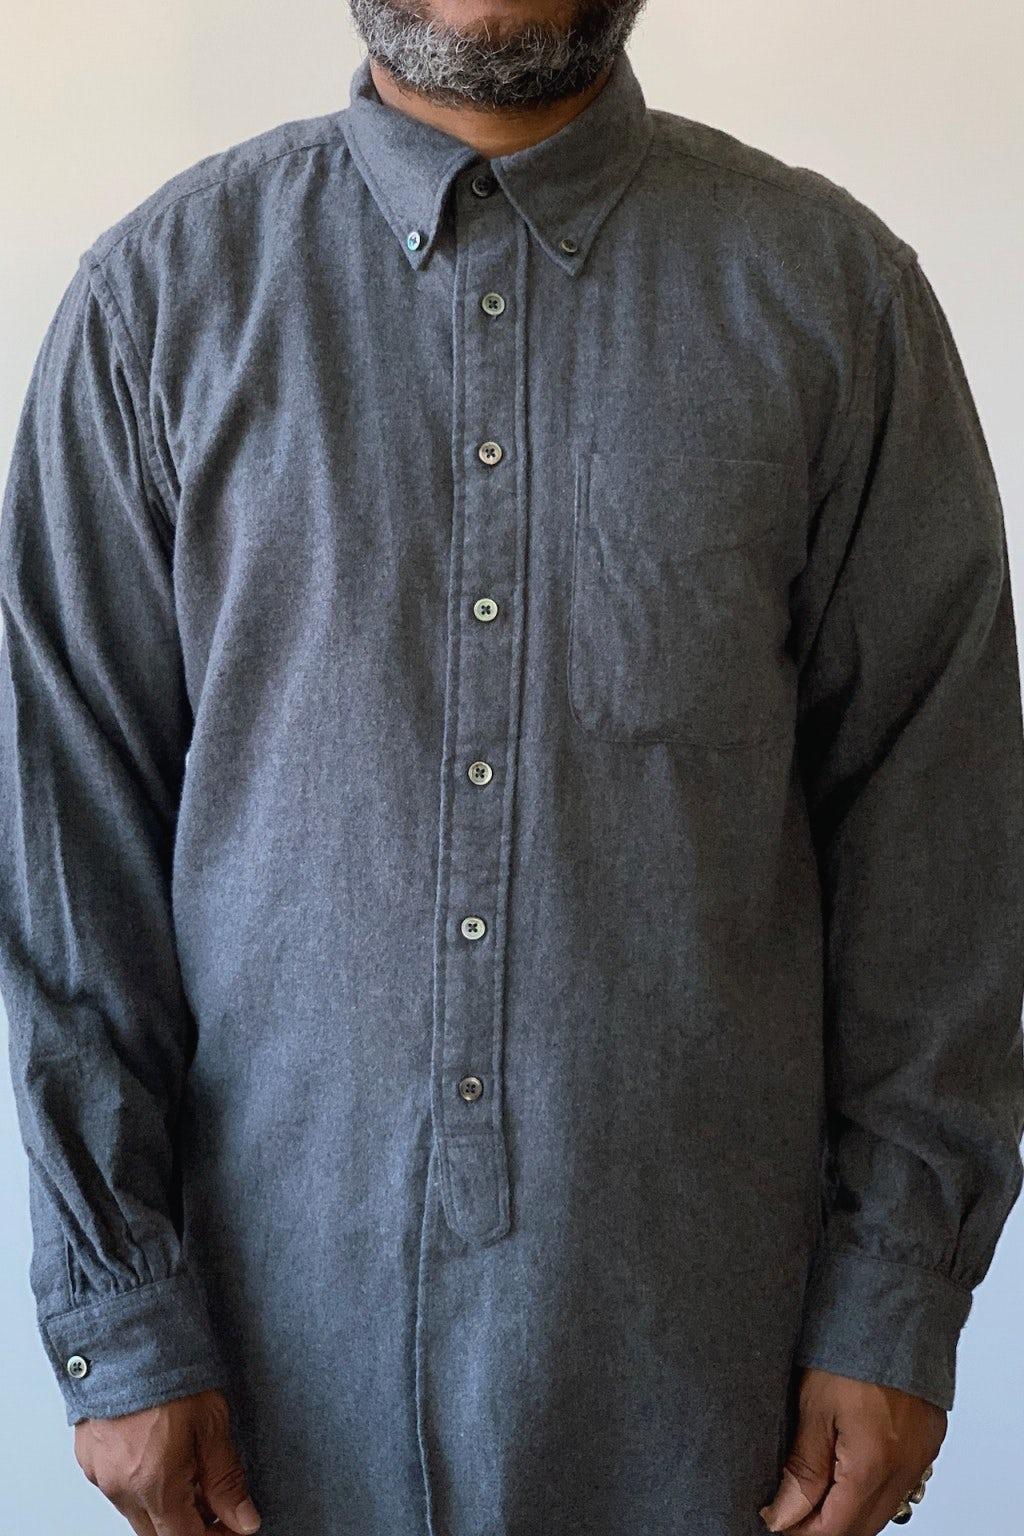 Engineered Garments 19th Century BD Shirt Dark Grey Brushed Cotton Twill